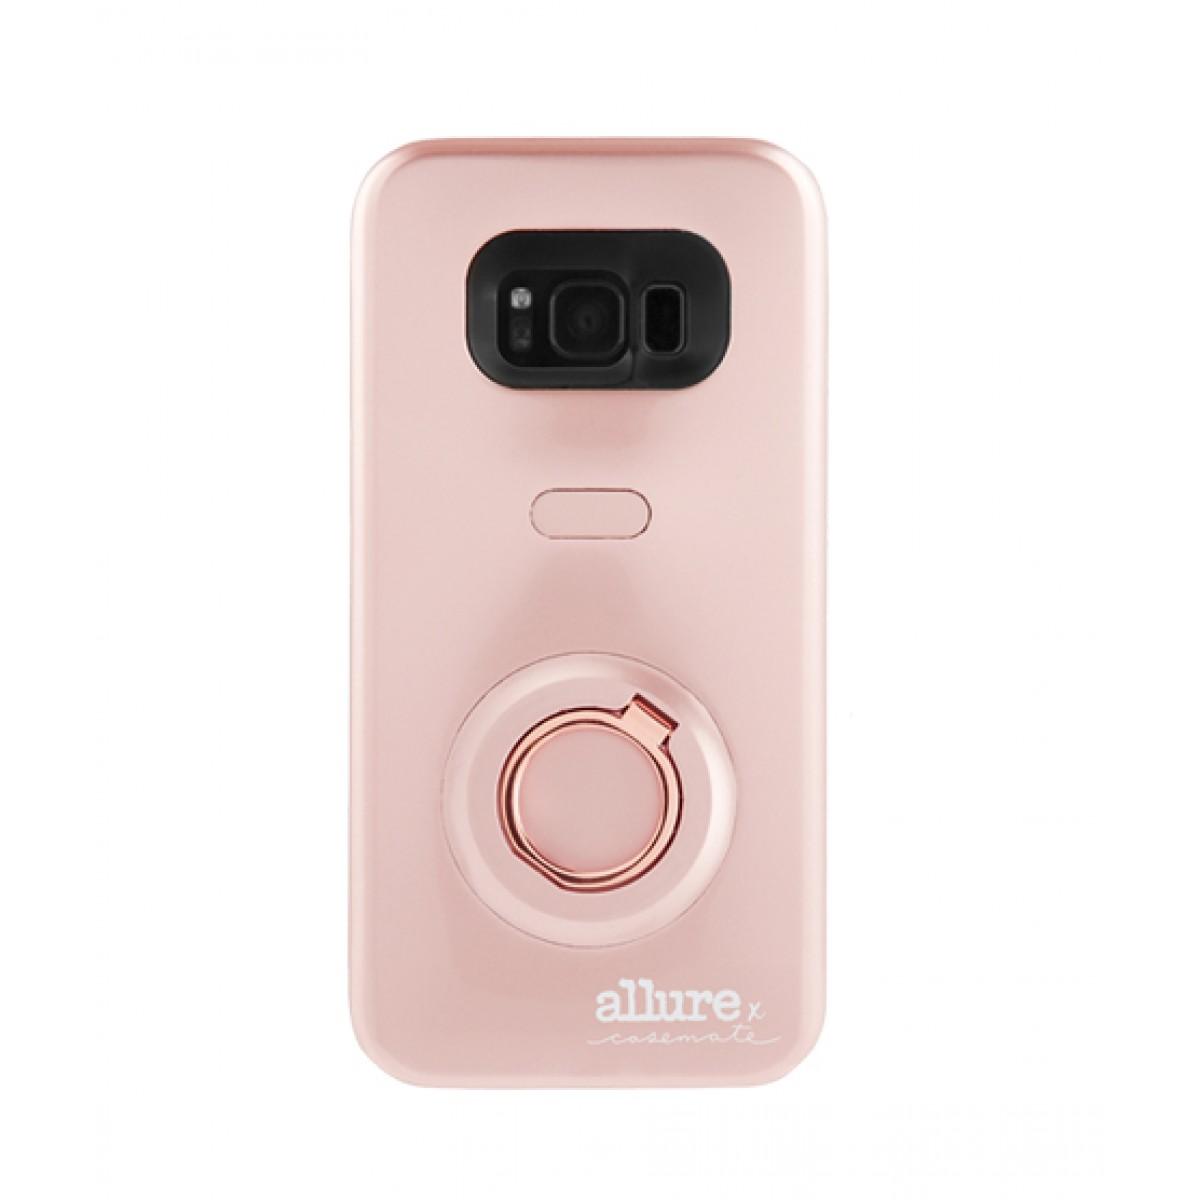 detailed look 6c10d 6ecc6 Case Mate Allure Selfie Rose Gold Case For Galaxy S8